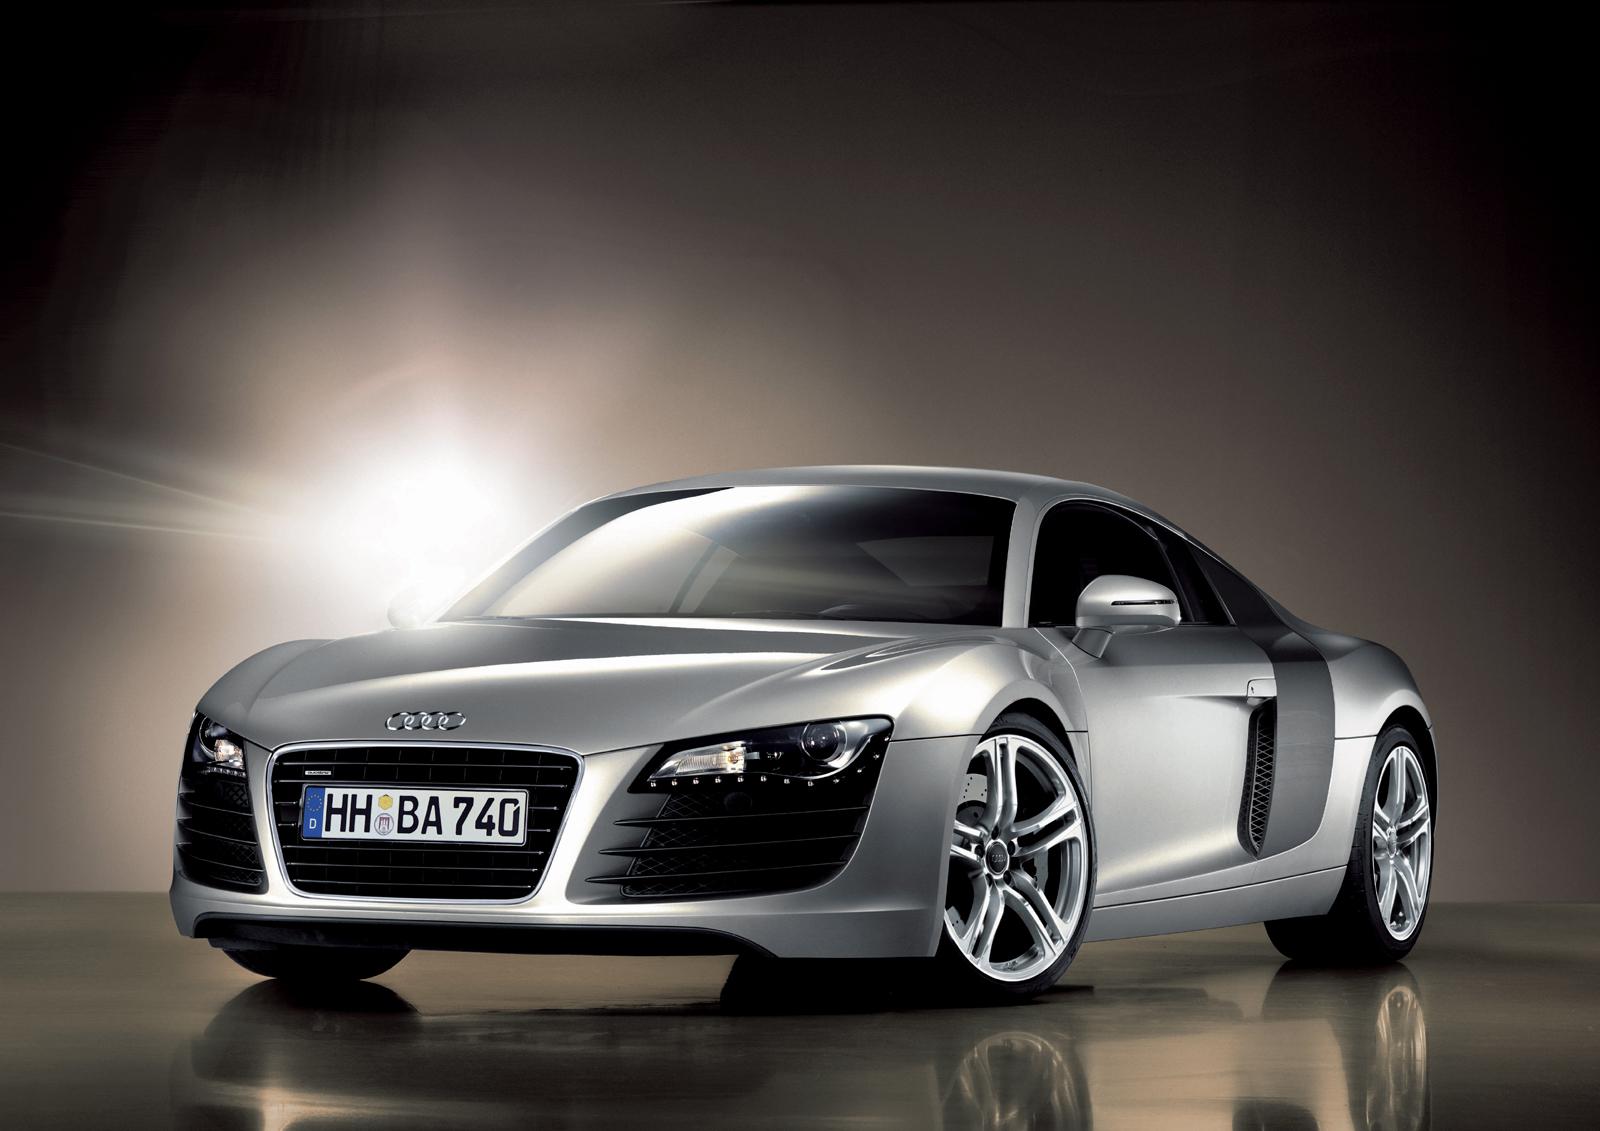 2009 Audi R8 Best Pic